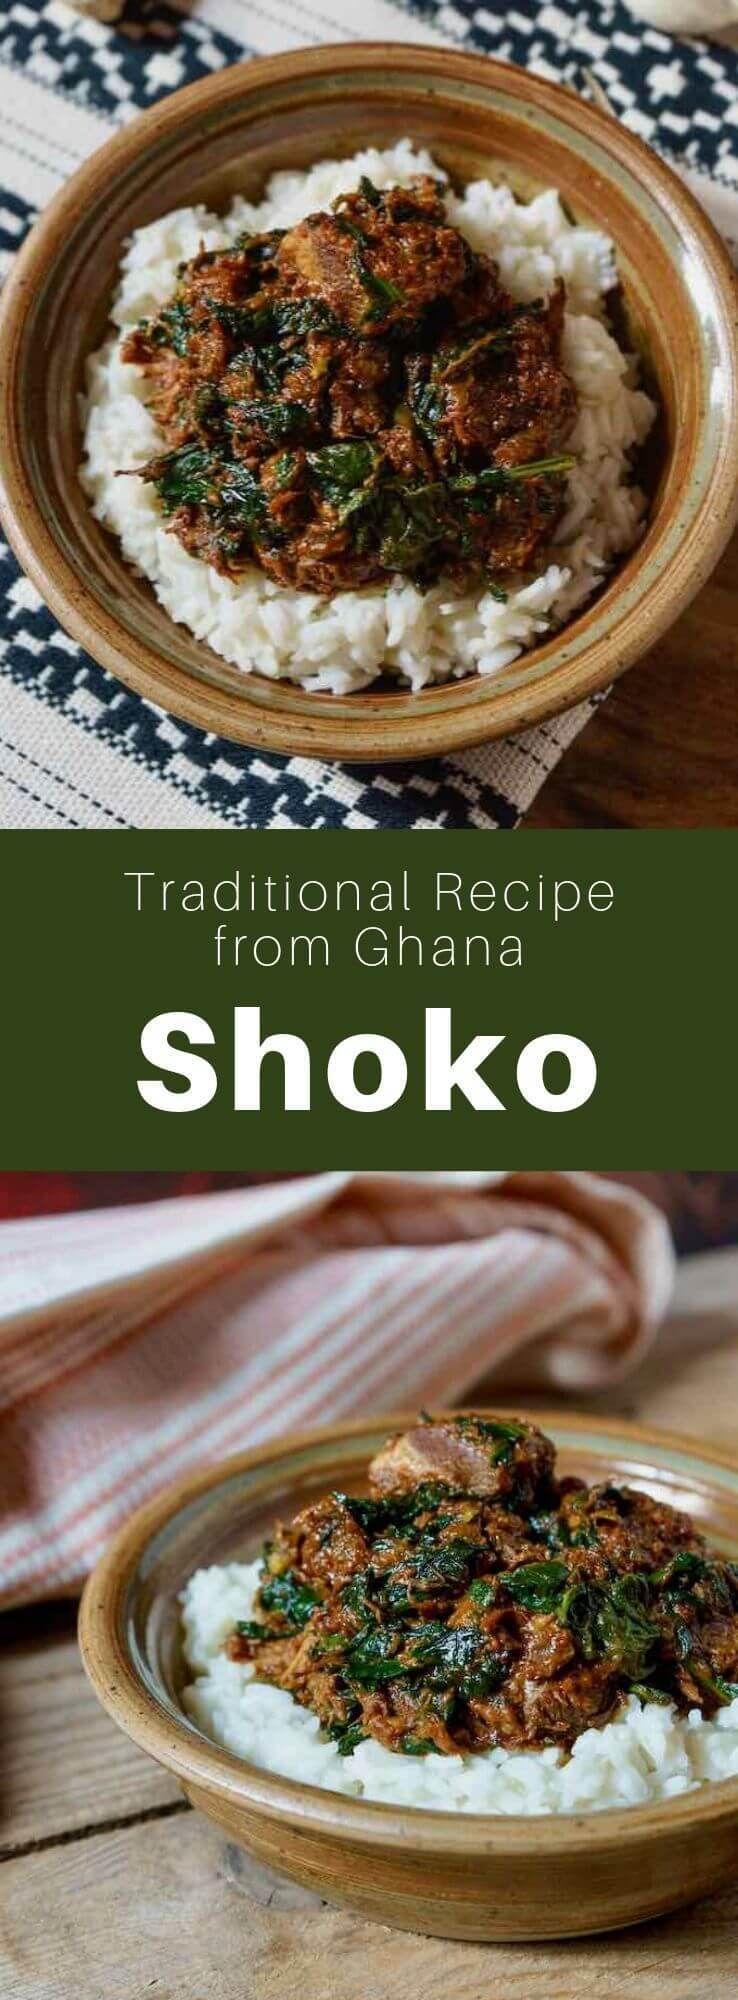 Ghana Shoko Beef And Alefu Stew In 2020 Ghanaian Food African Food Recipes